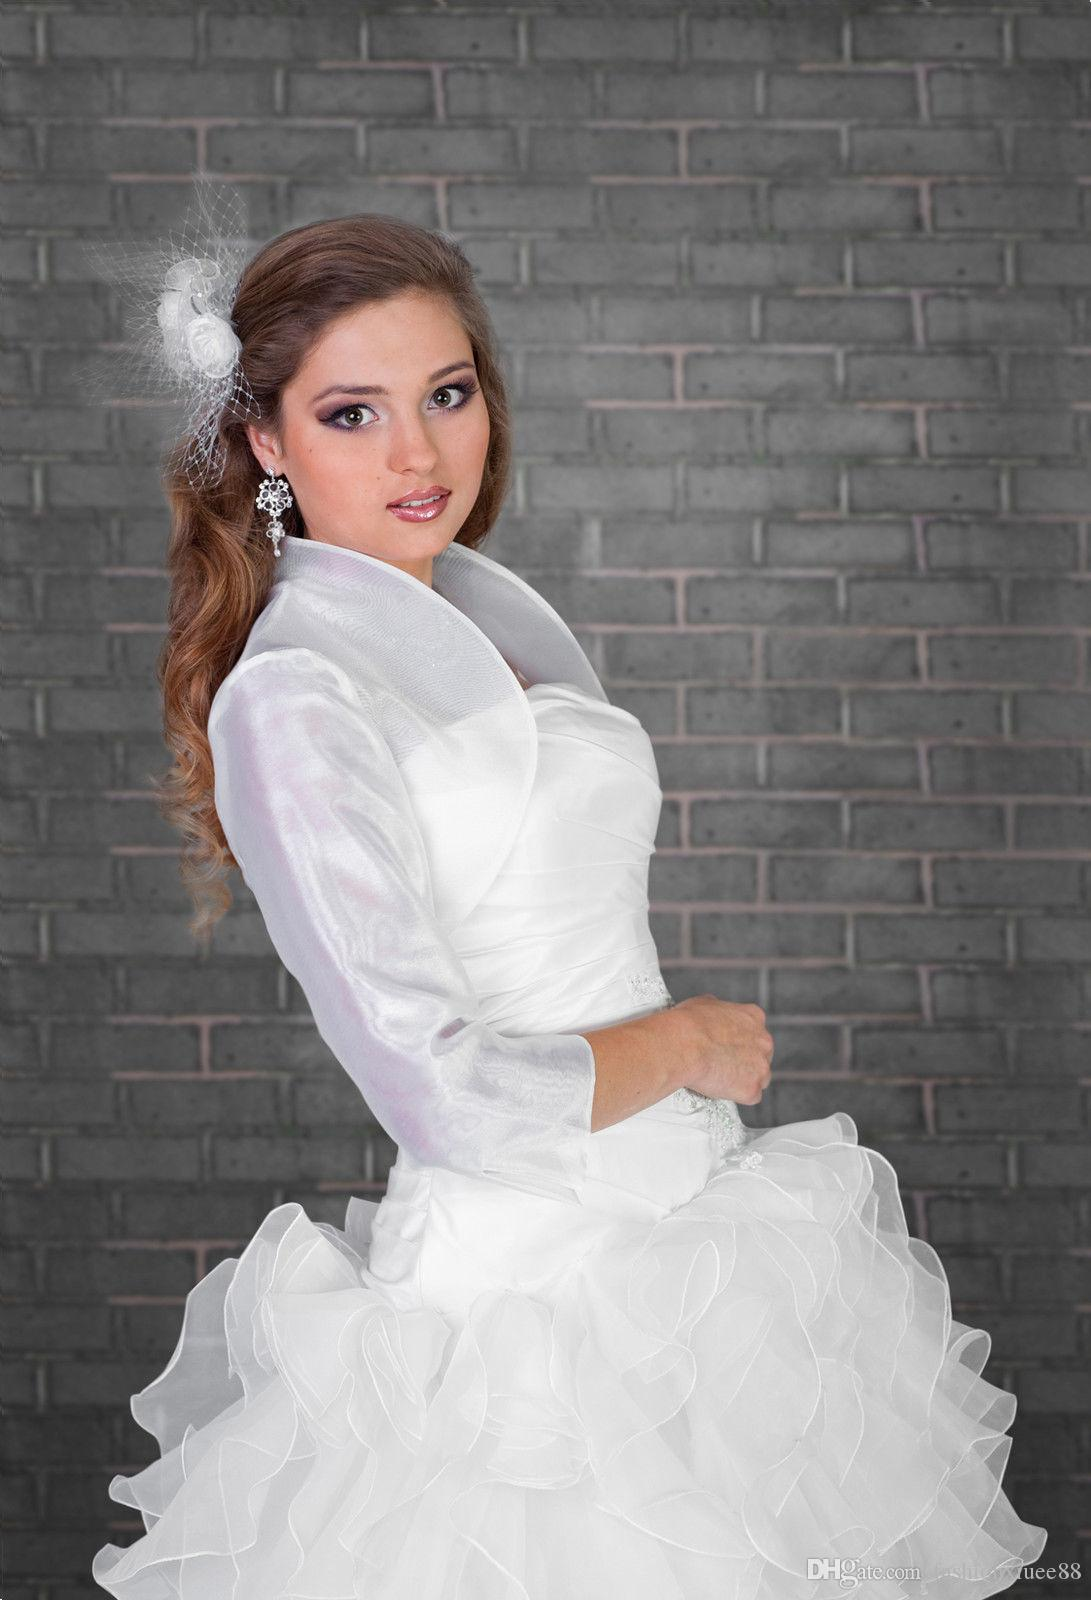 New Women Ladies Ivory Wedding Prom Satin Bolero Shrug Jacket Size S M L XL XXL